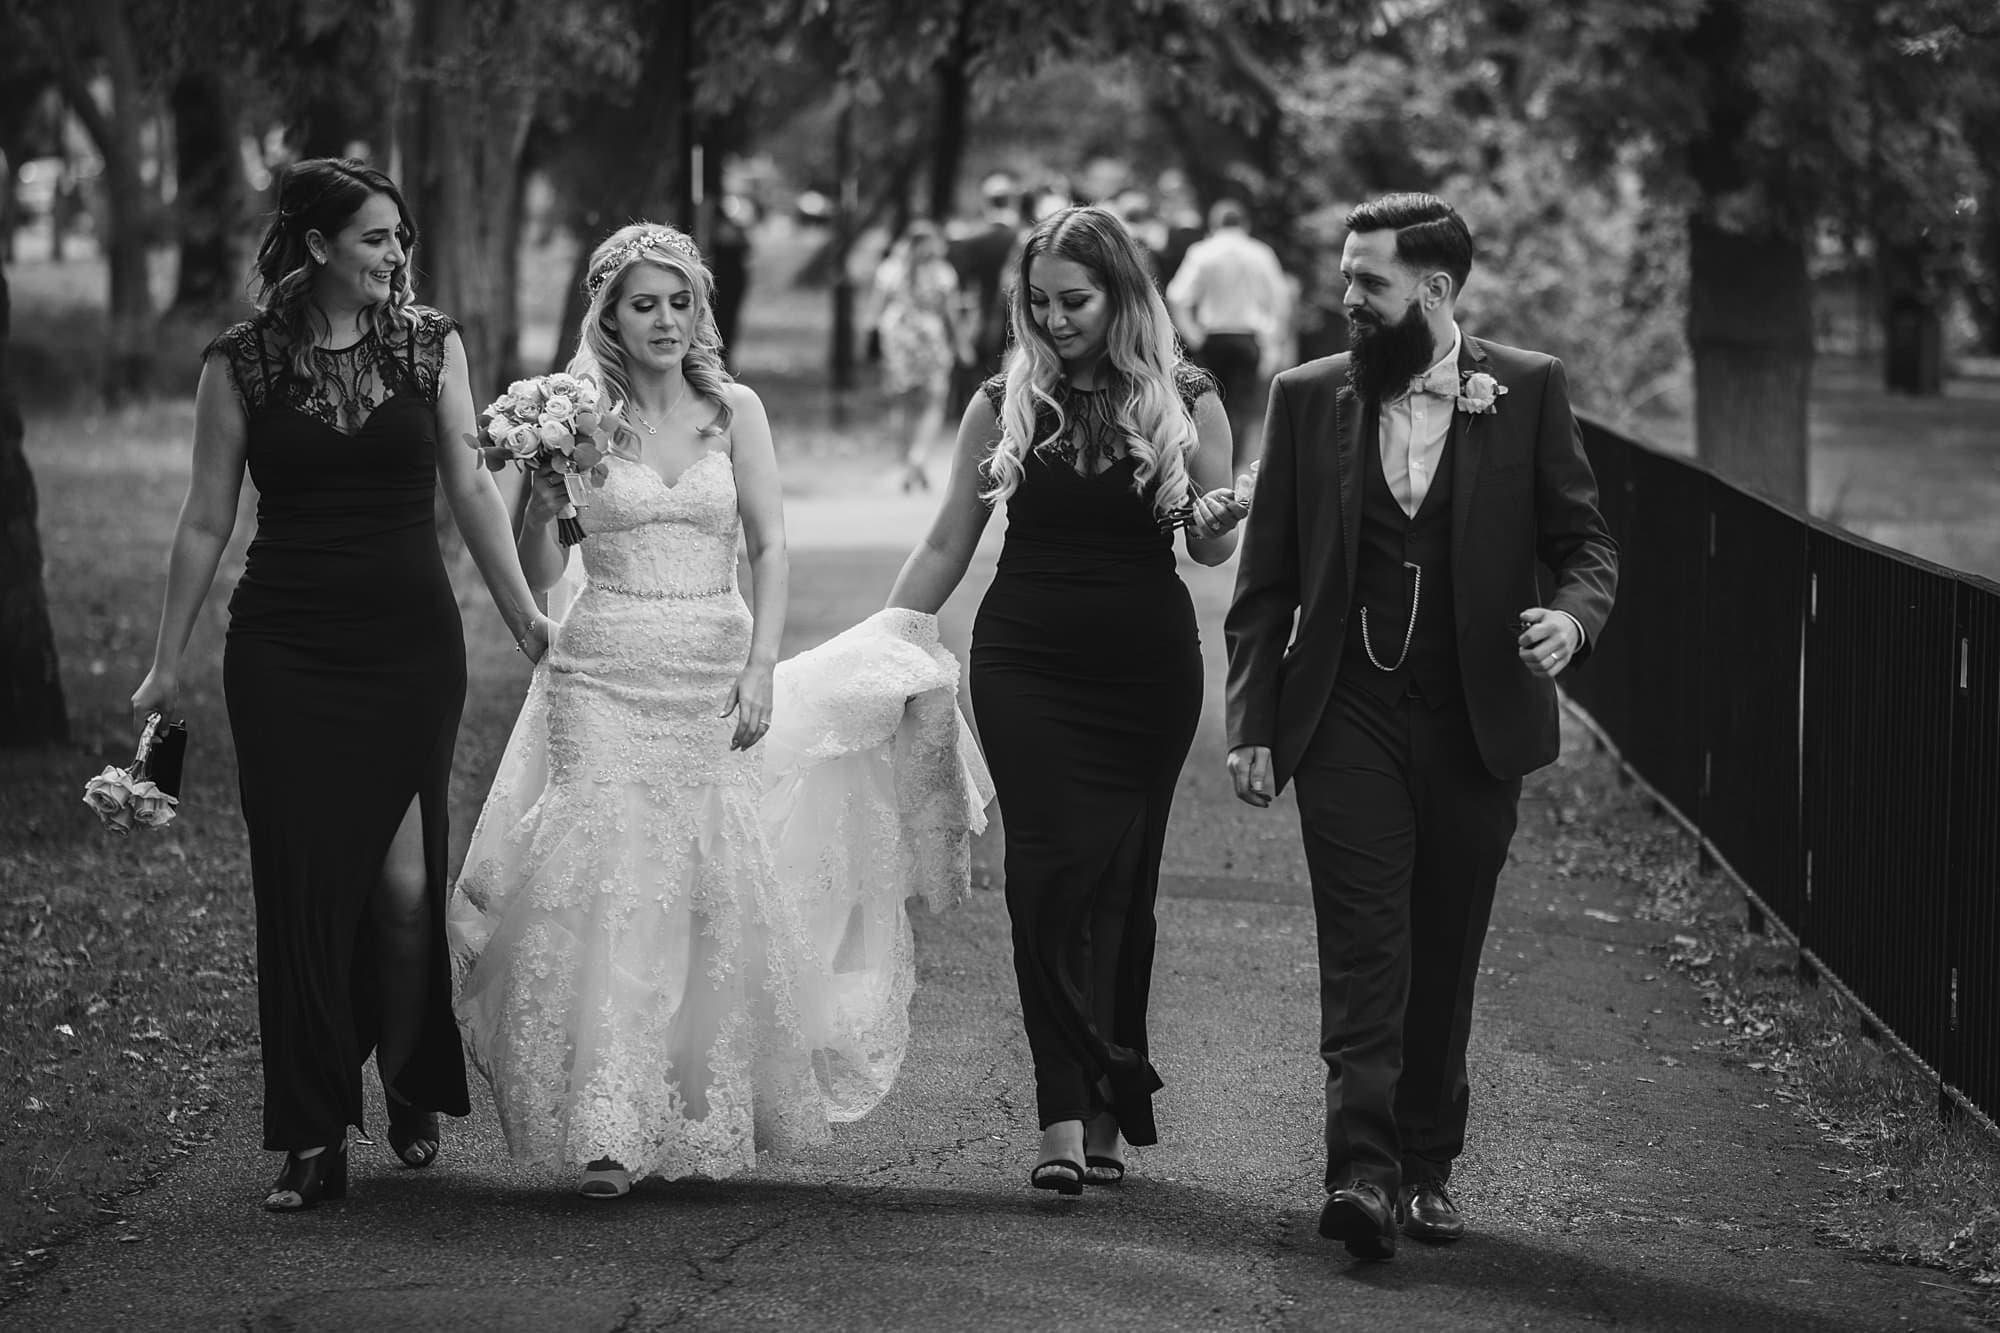 london pub wedding photographer jn 023 - The County Arms Wedding Photographer   Jen & Nick